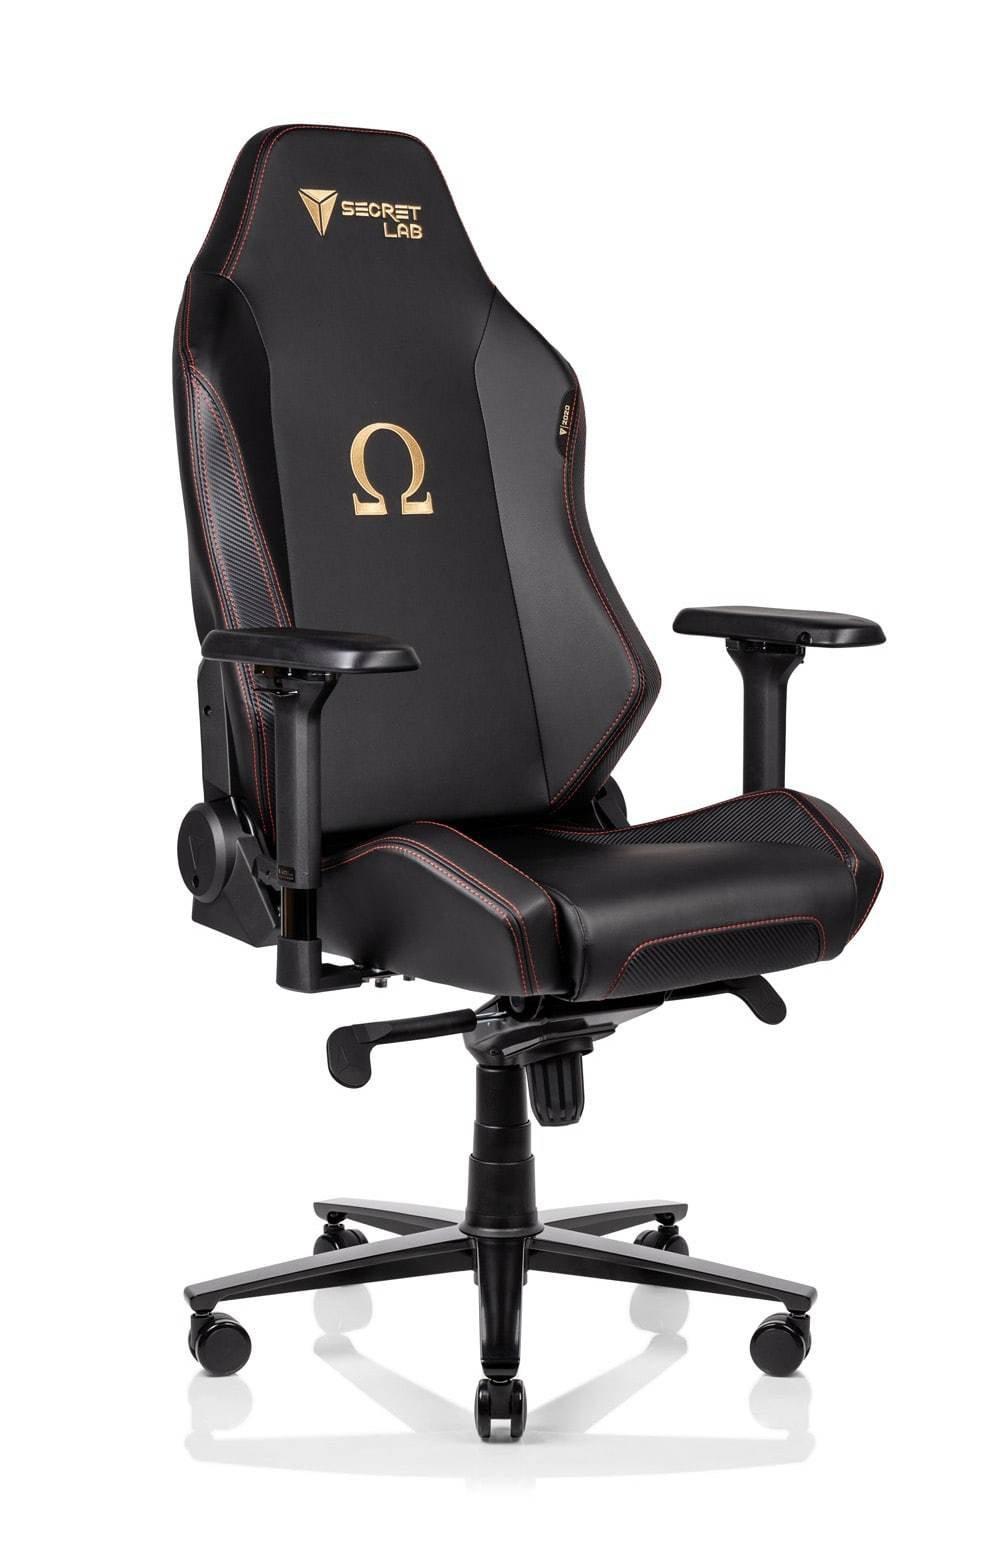 игровое кресло Секретлаб омега карбон